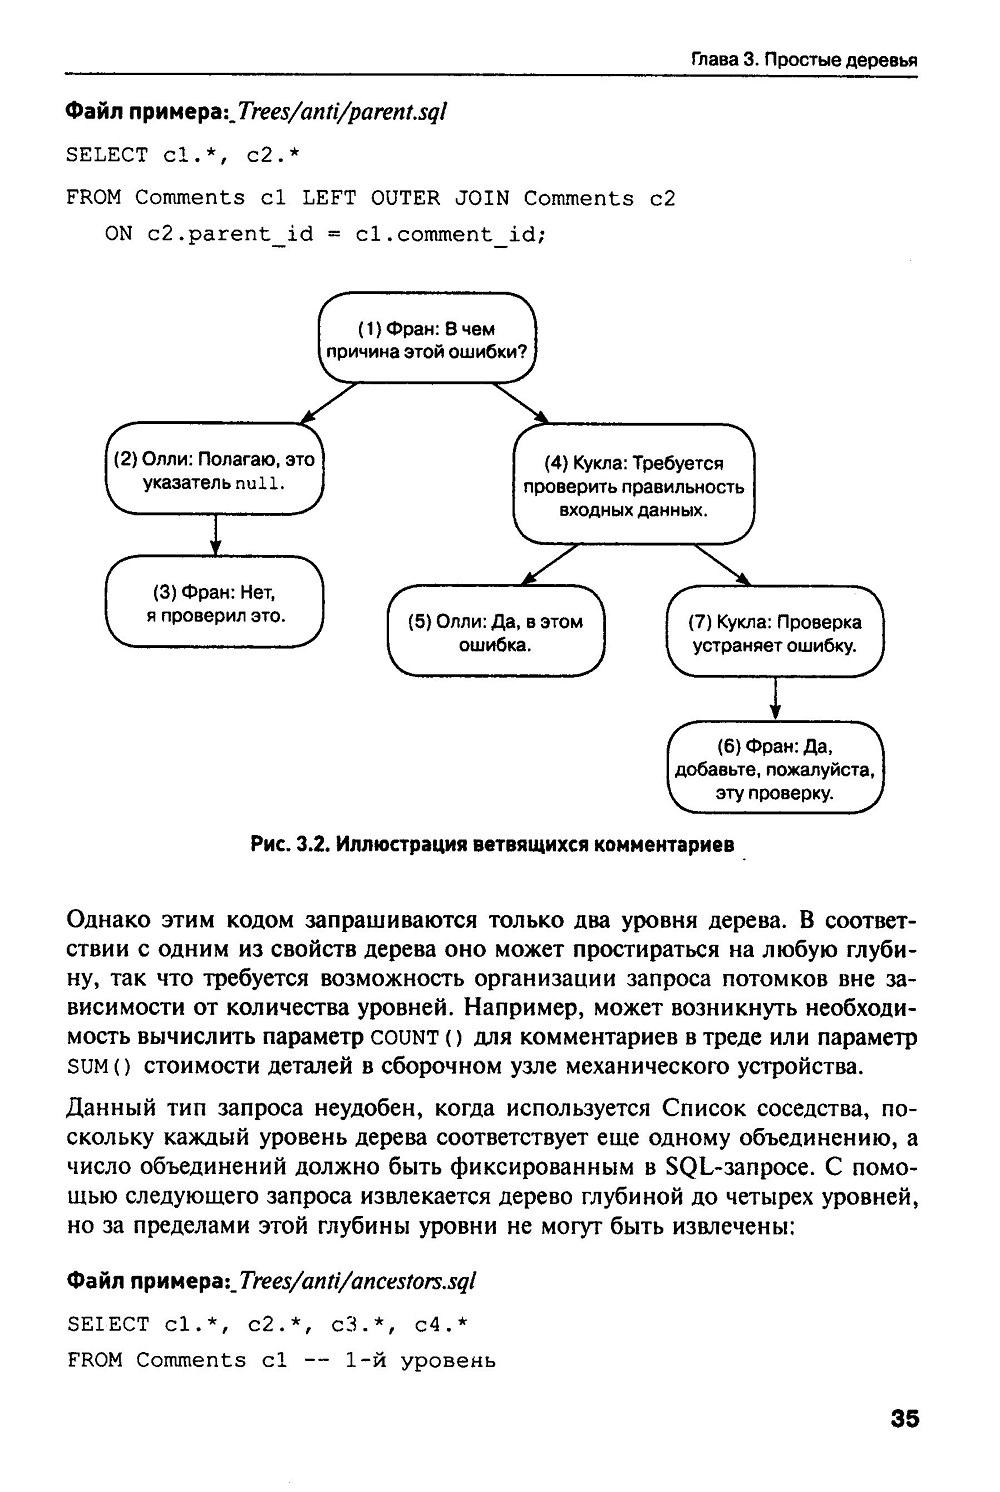 http://i2.imageban.ru/out/2014/01/20/6bbebc5a05d1b414962e415210c5a455.jpg